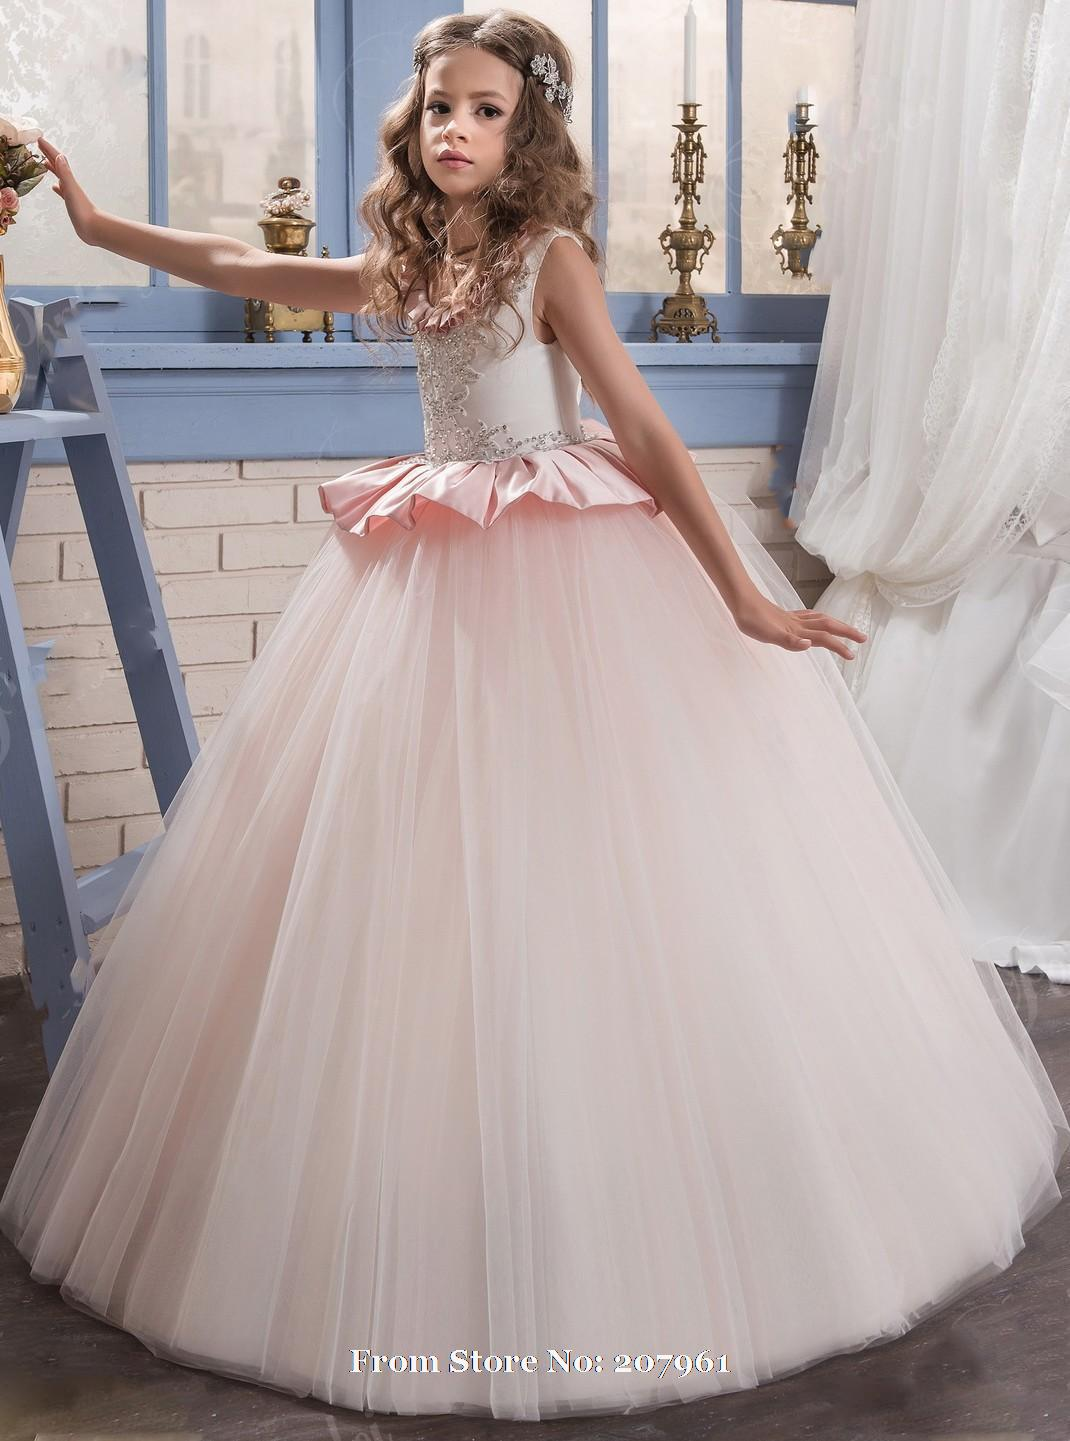 Romantic 2016 Pink Puffy Flower Girl Dress for Weddings